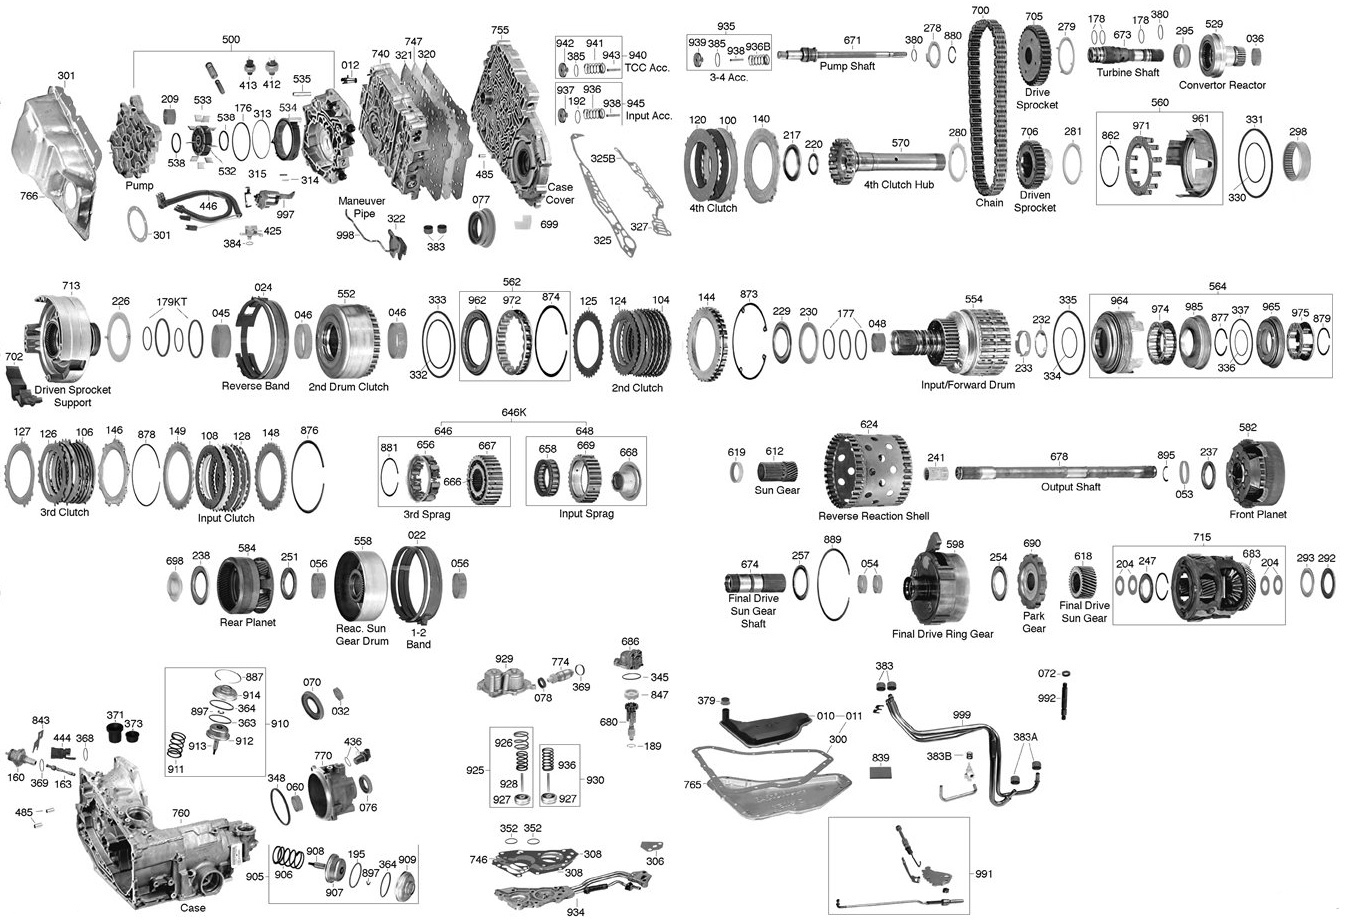 4t60 transmission diagram wiring diagram all data 4T60E Transmission Fluid Change 4t60 transmission diagram wiring diagram blog data mazda 3 transmission diagram 4t60 transmission diagram